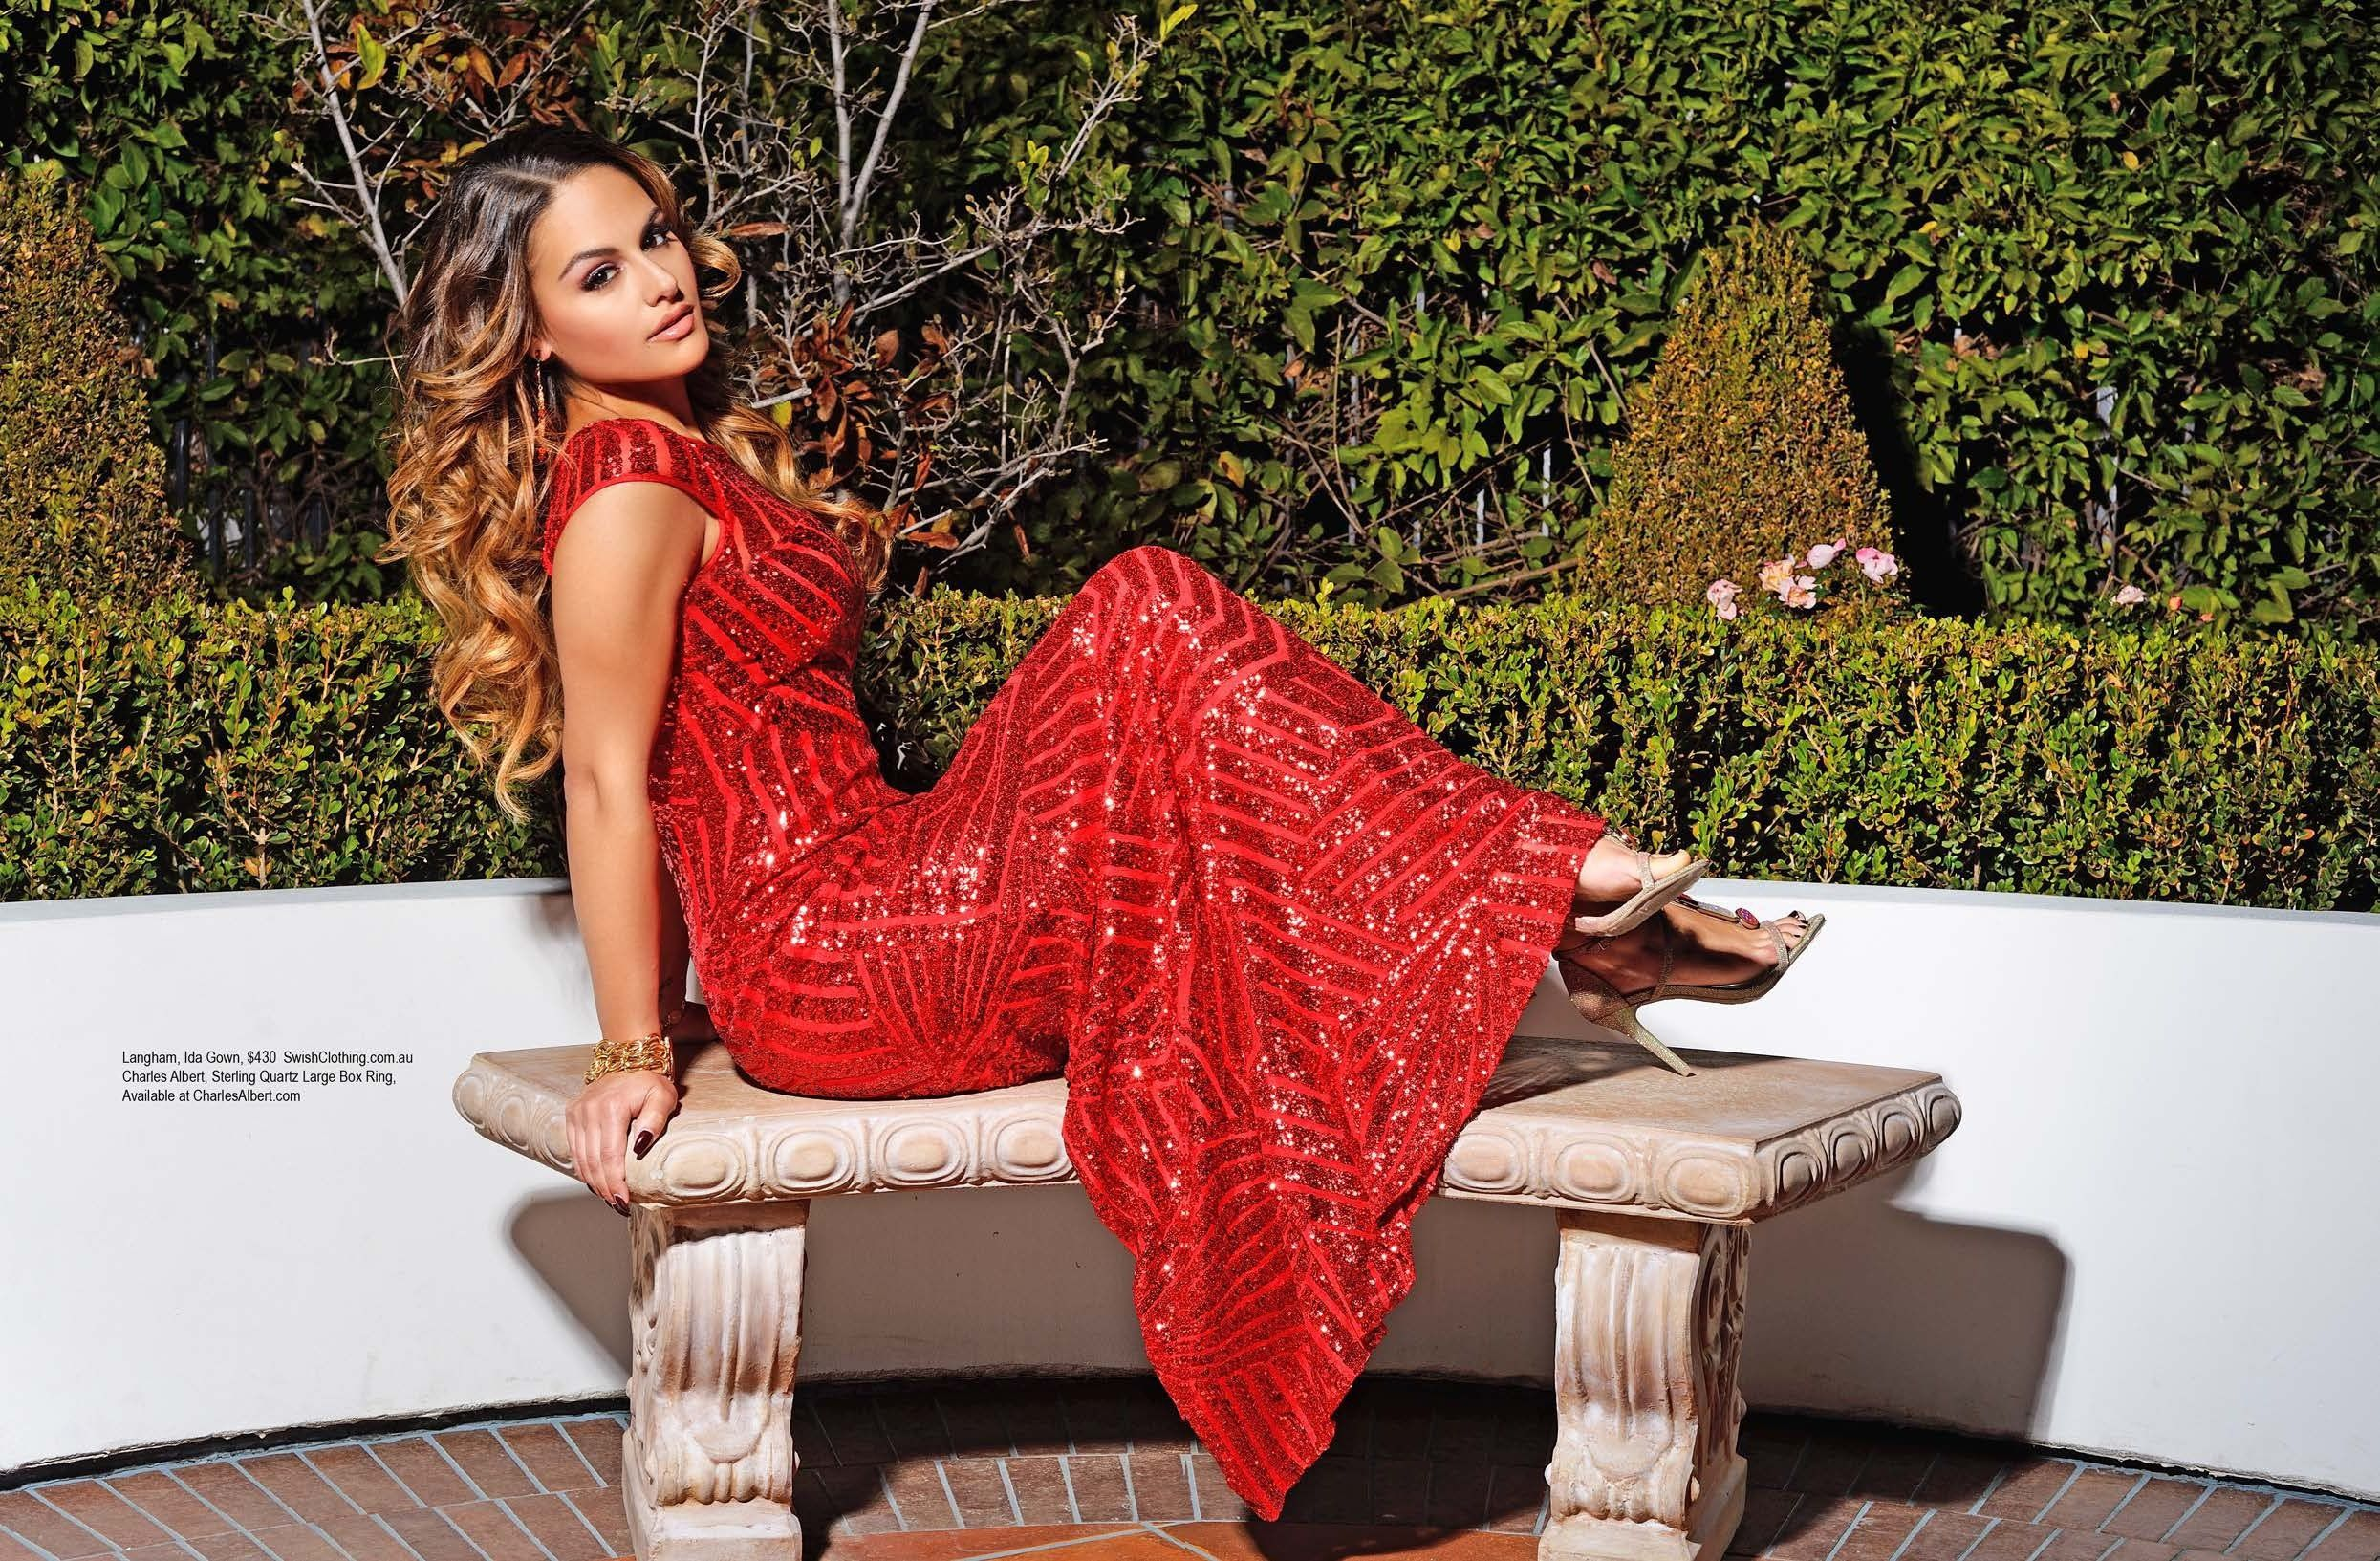 Pia Toscano pose pour le magazine Regards